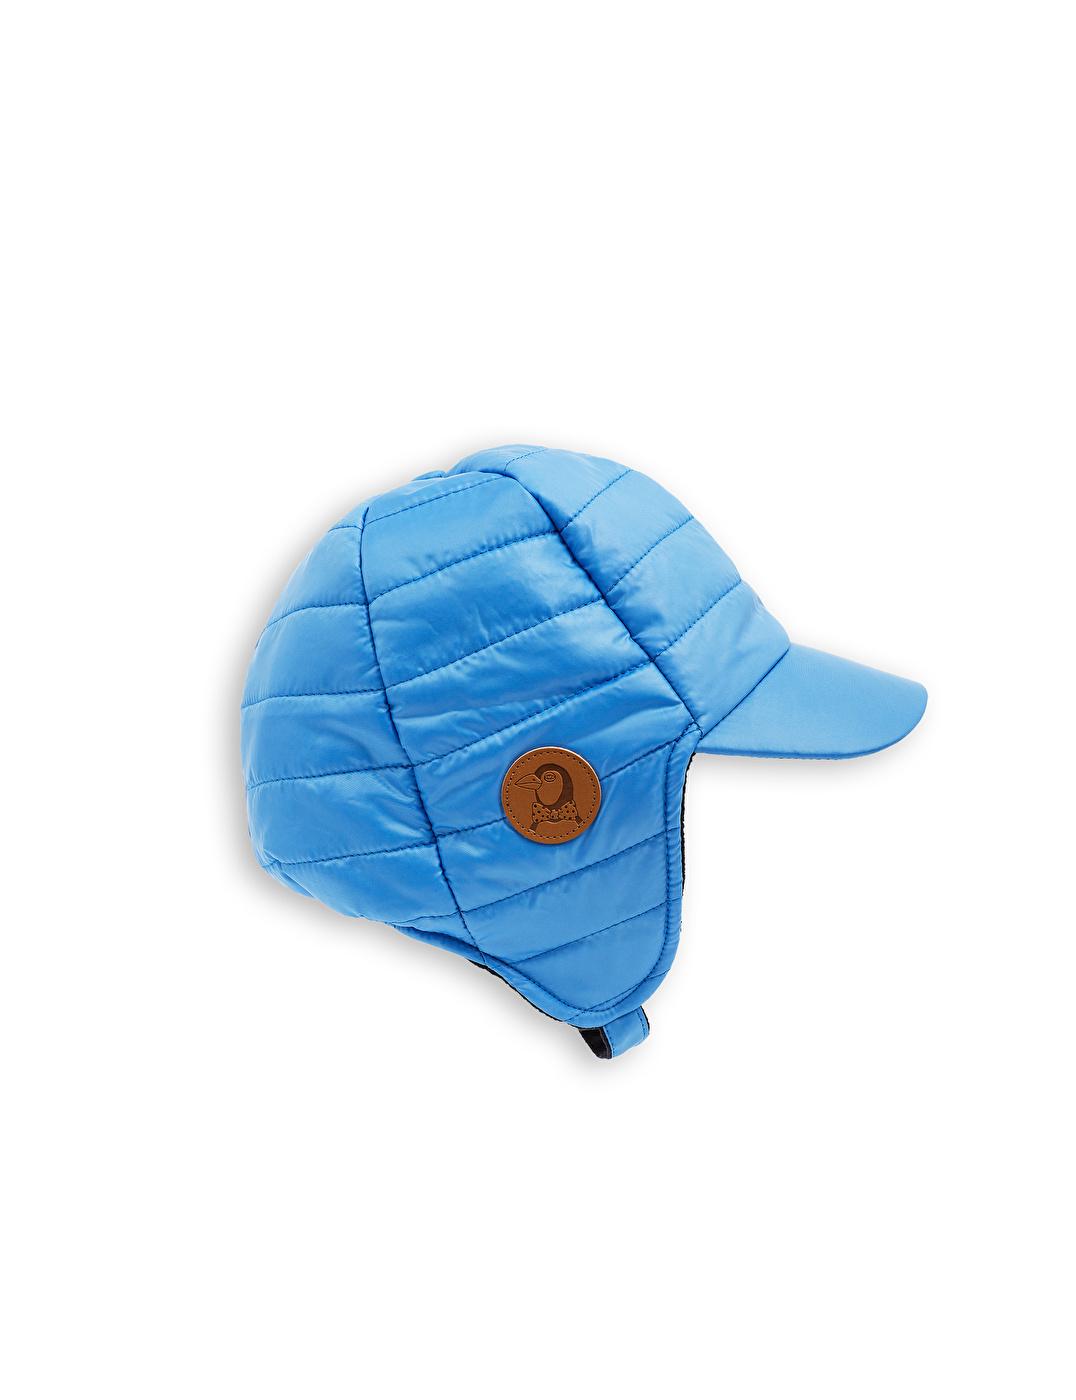 1776512050-2-mini-rodini-insulator-cap-light-blue